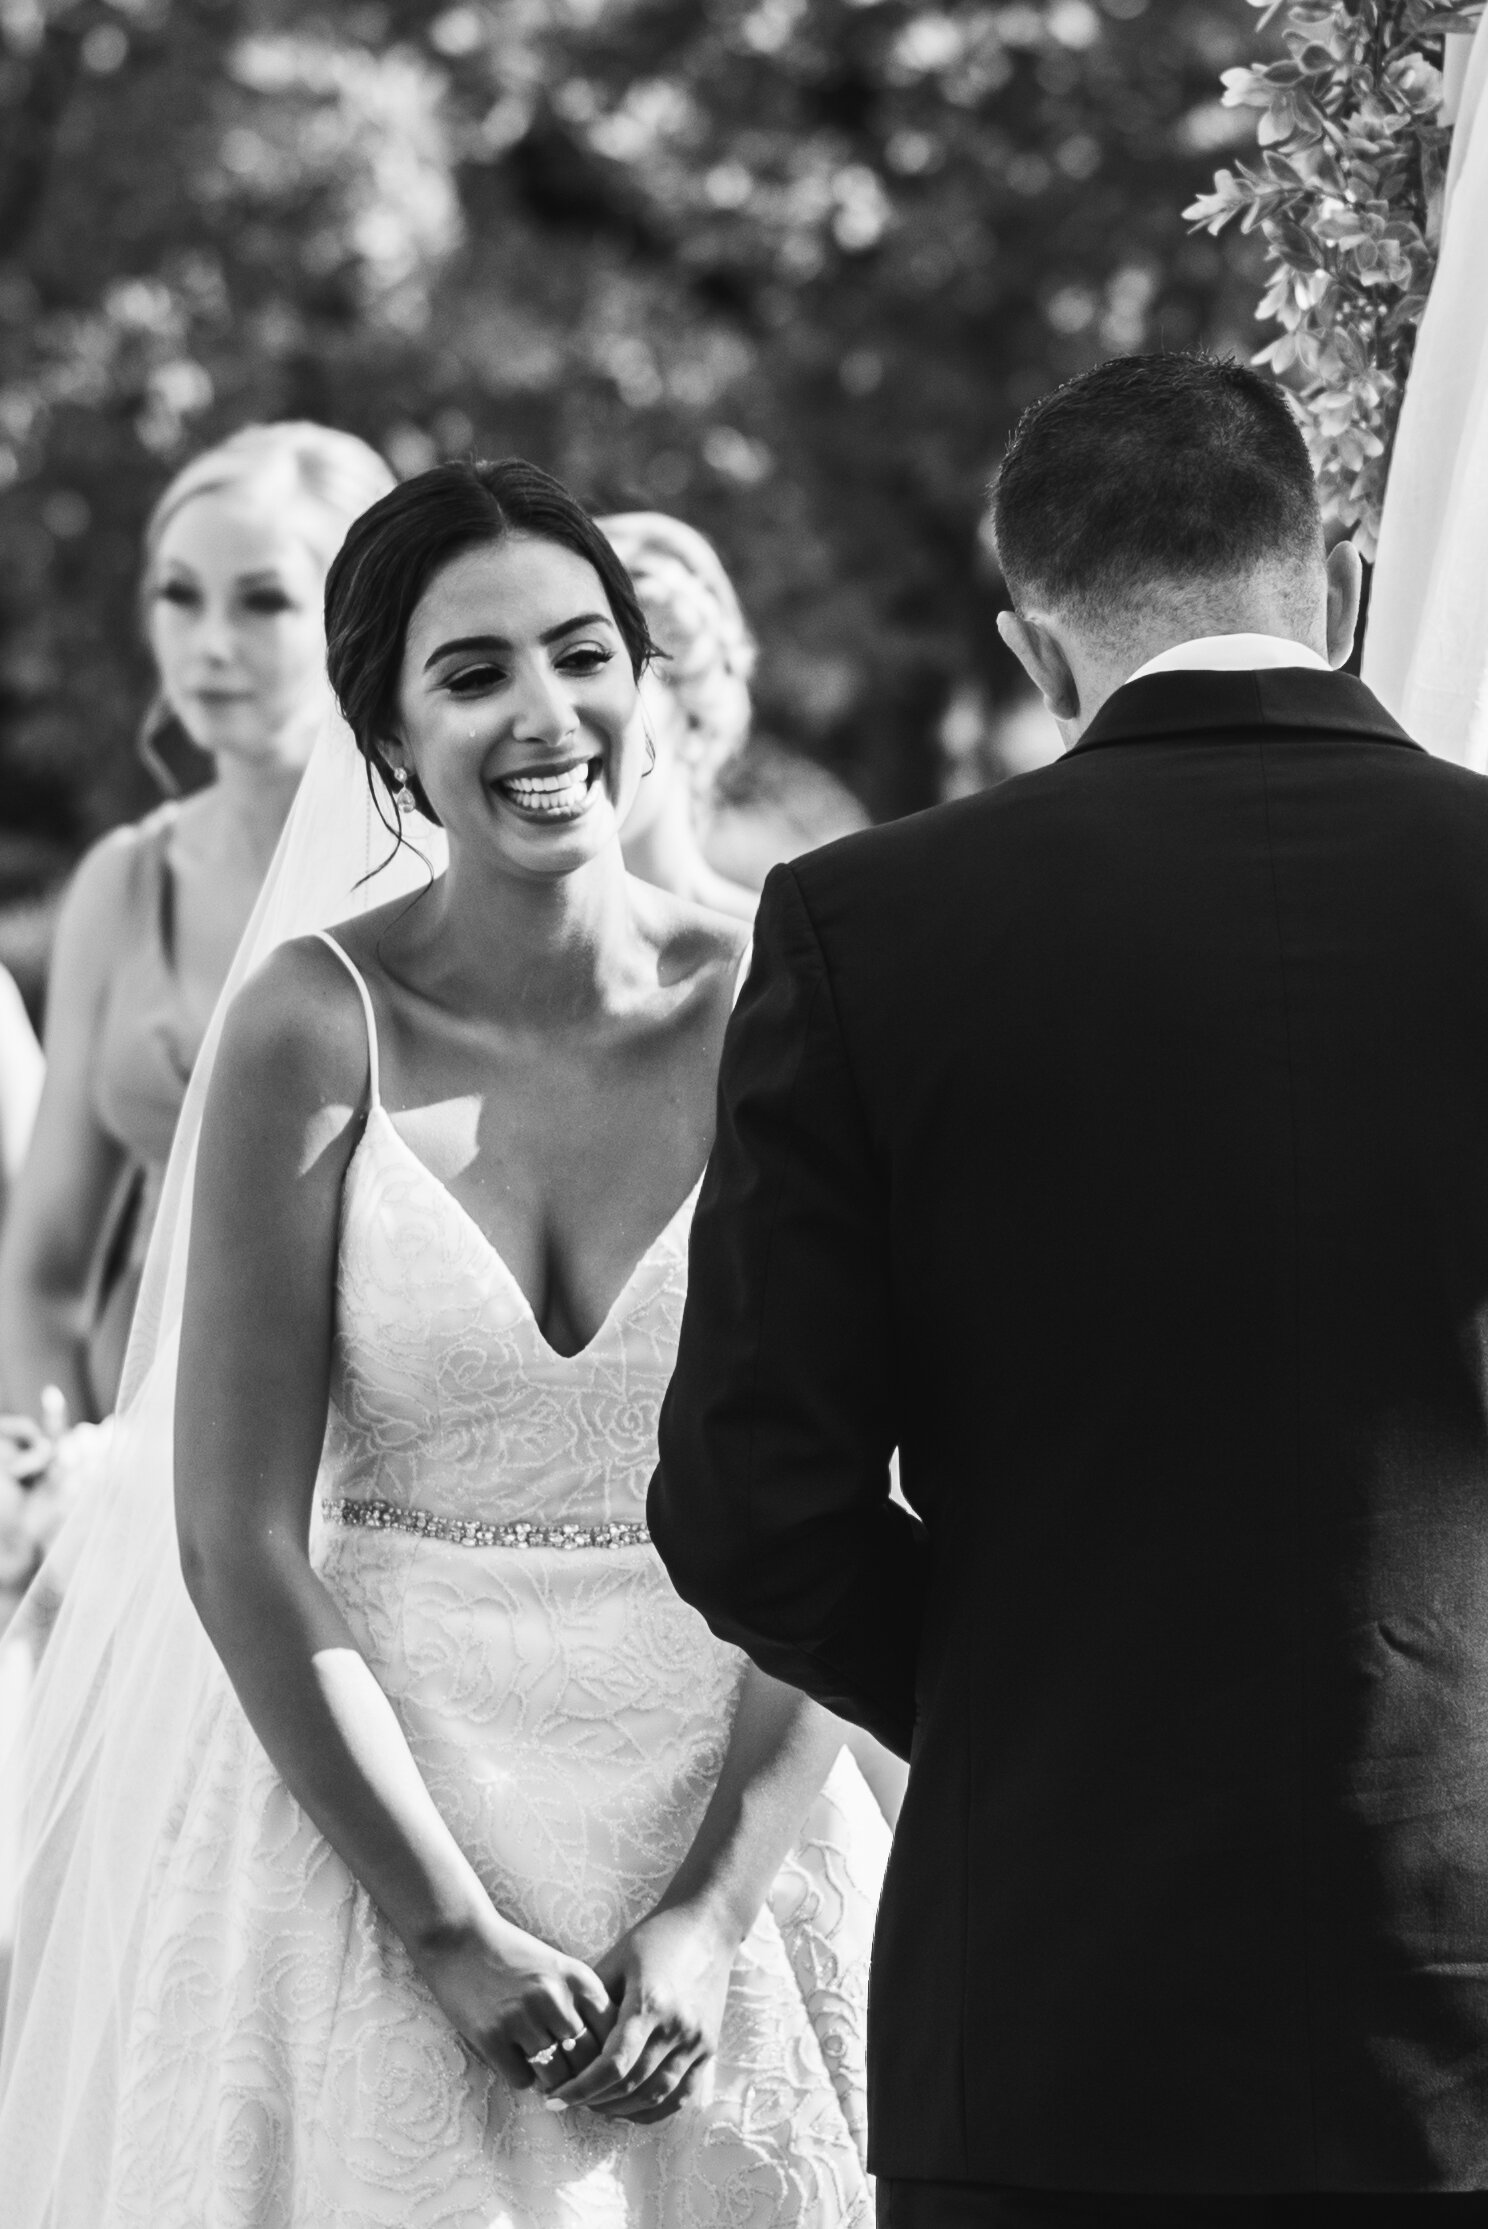 Natasha & Lee Sneak Peeks - August 31, 2019 Swaneset Wedding-6332.jpg